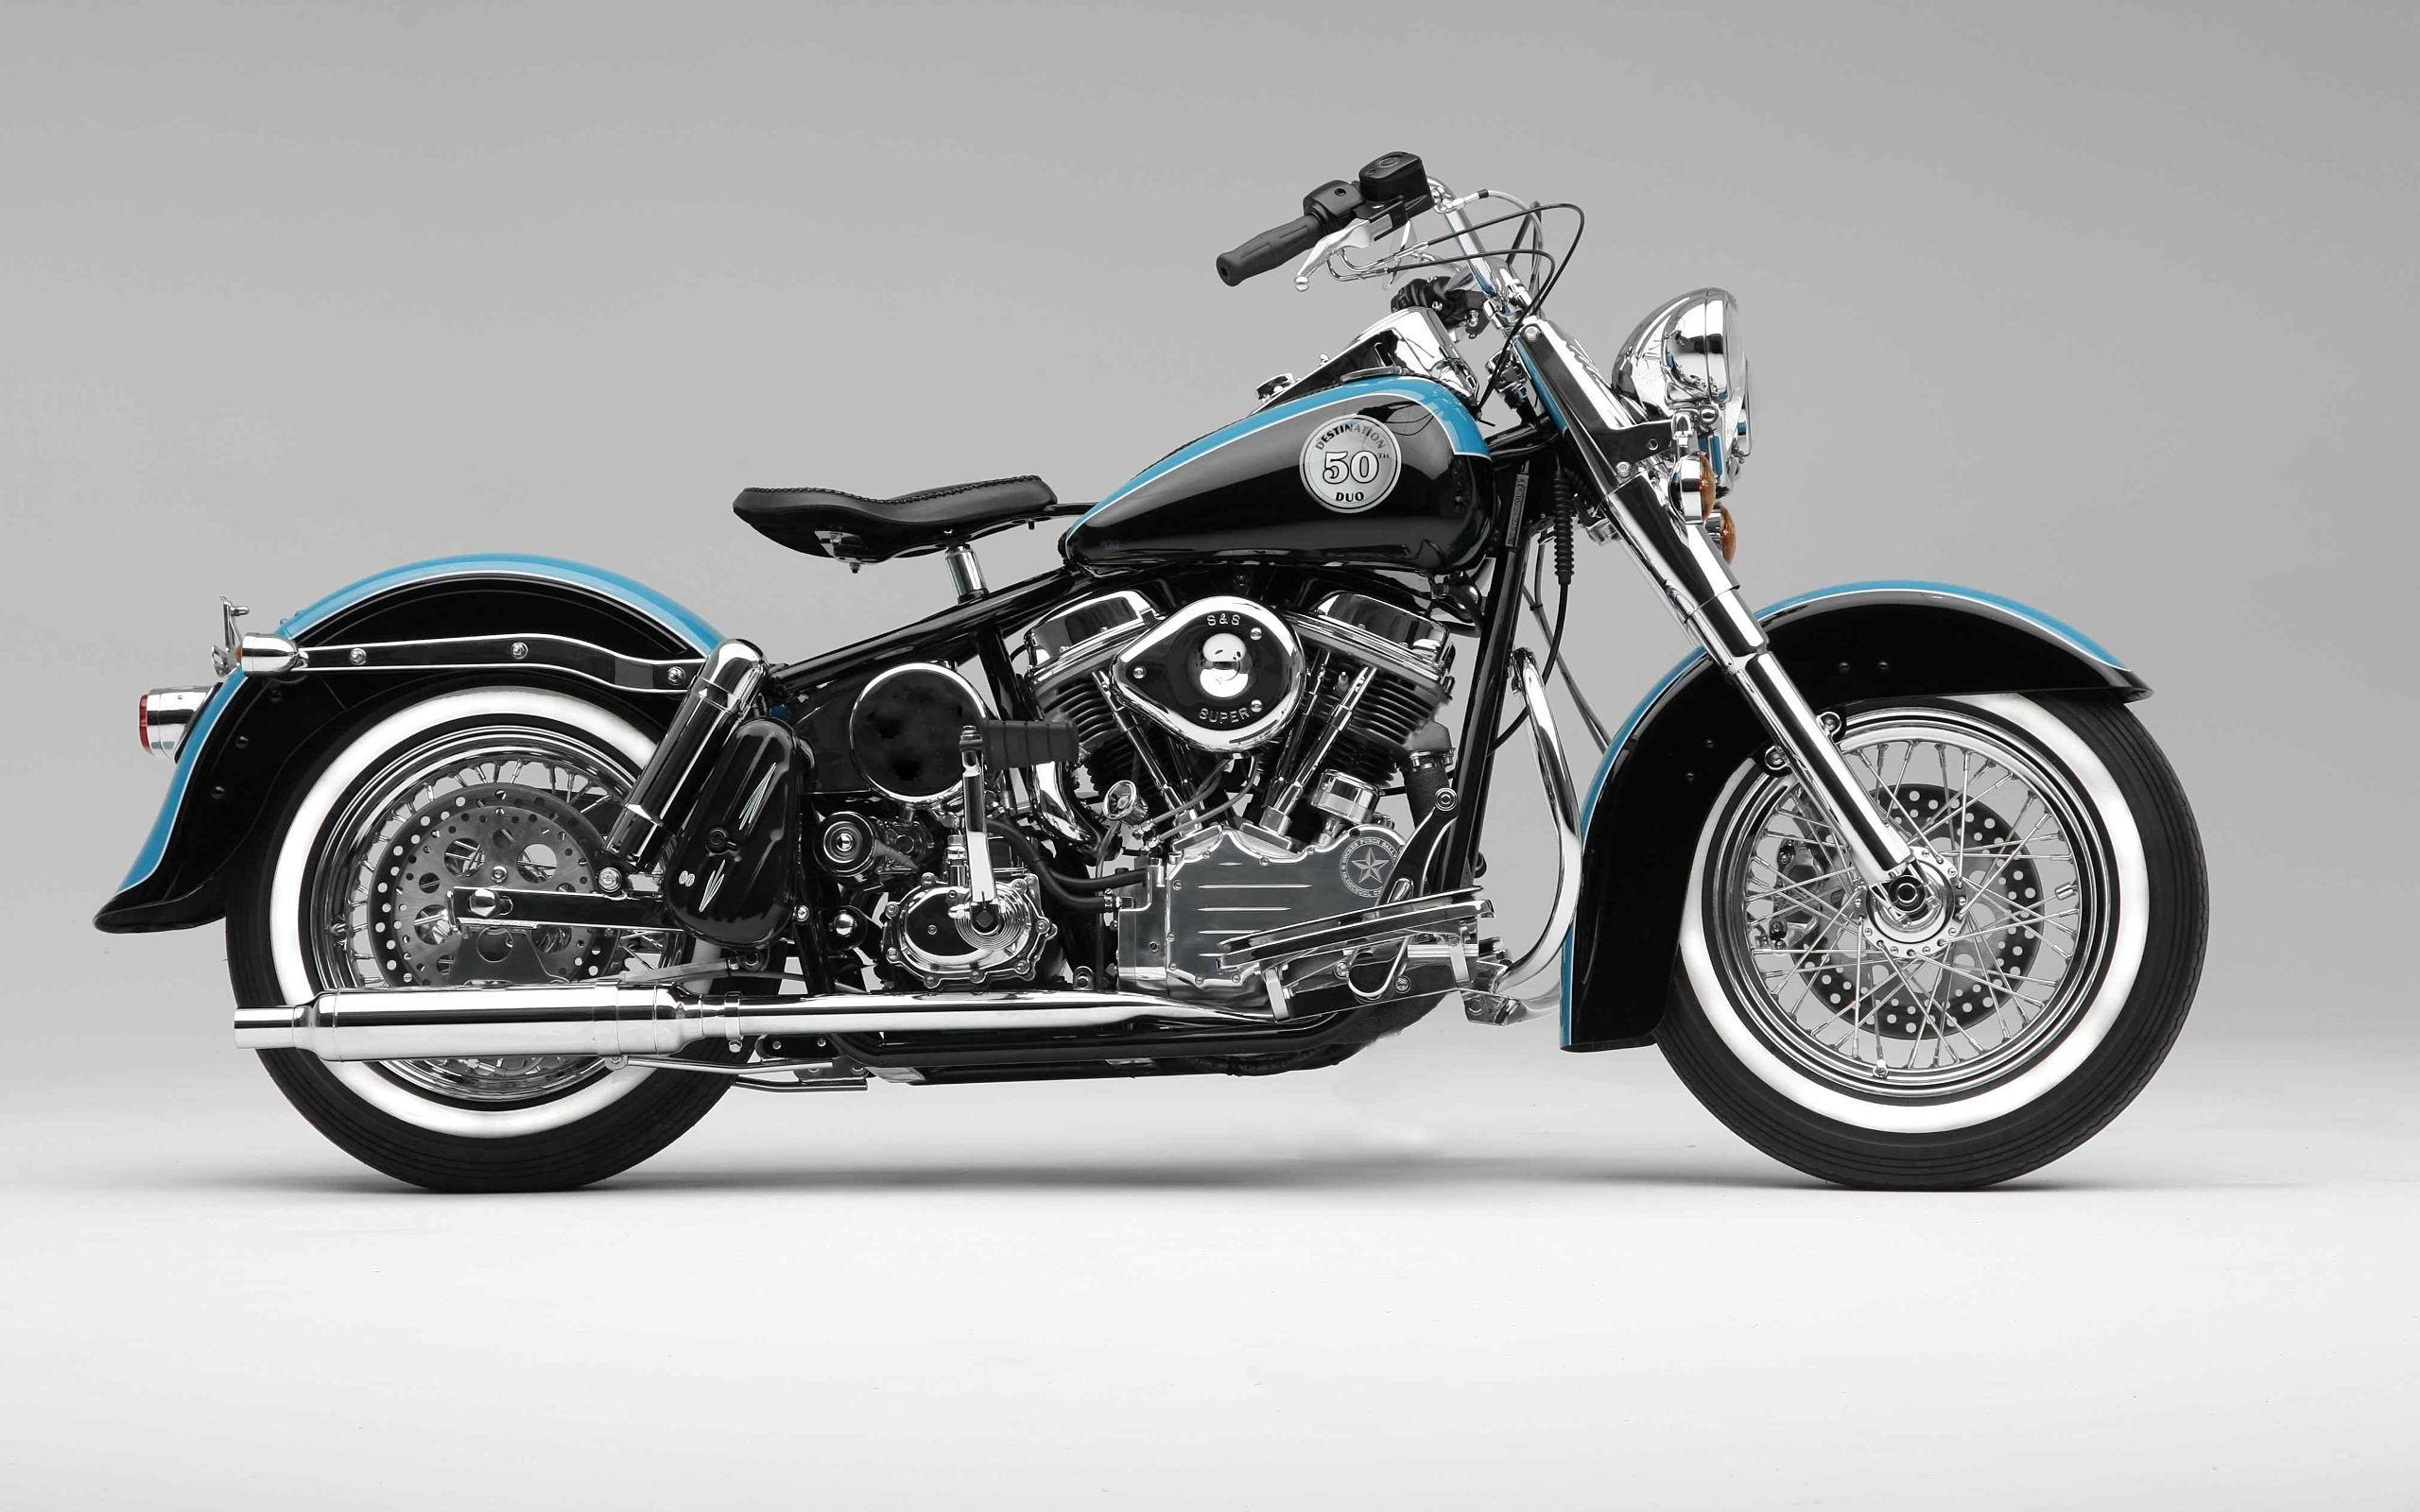 Harley Davidson Motorcycle Wallpaper 12090 Full HD